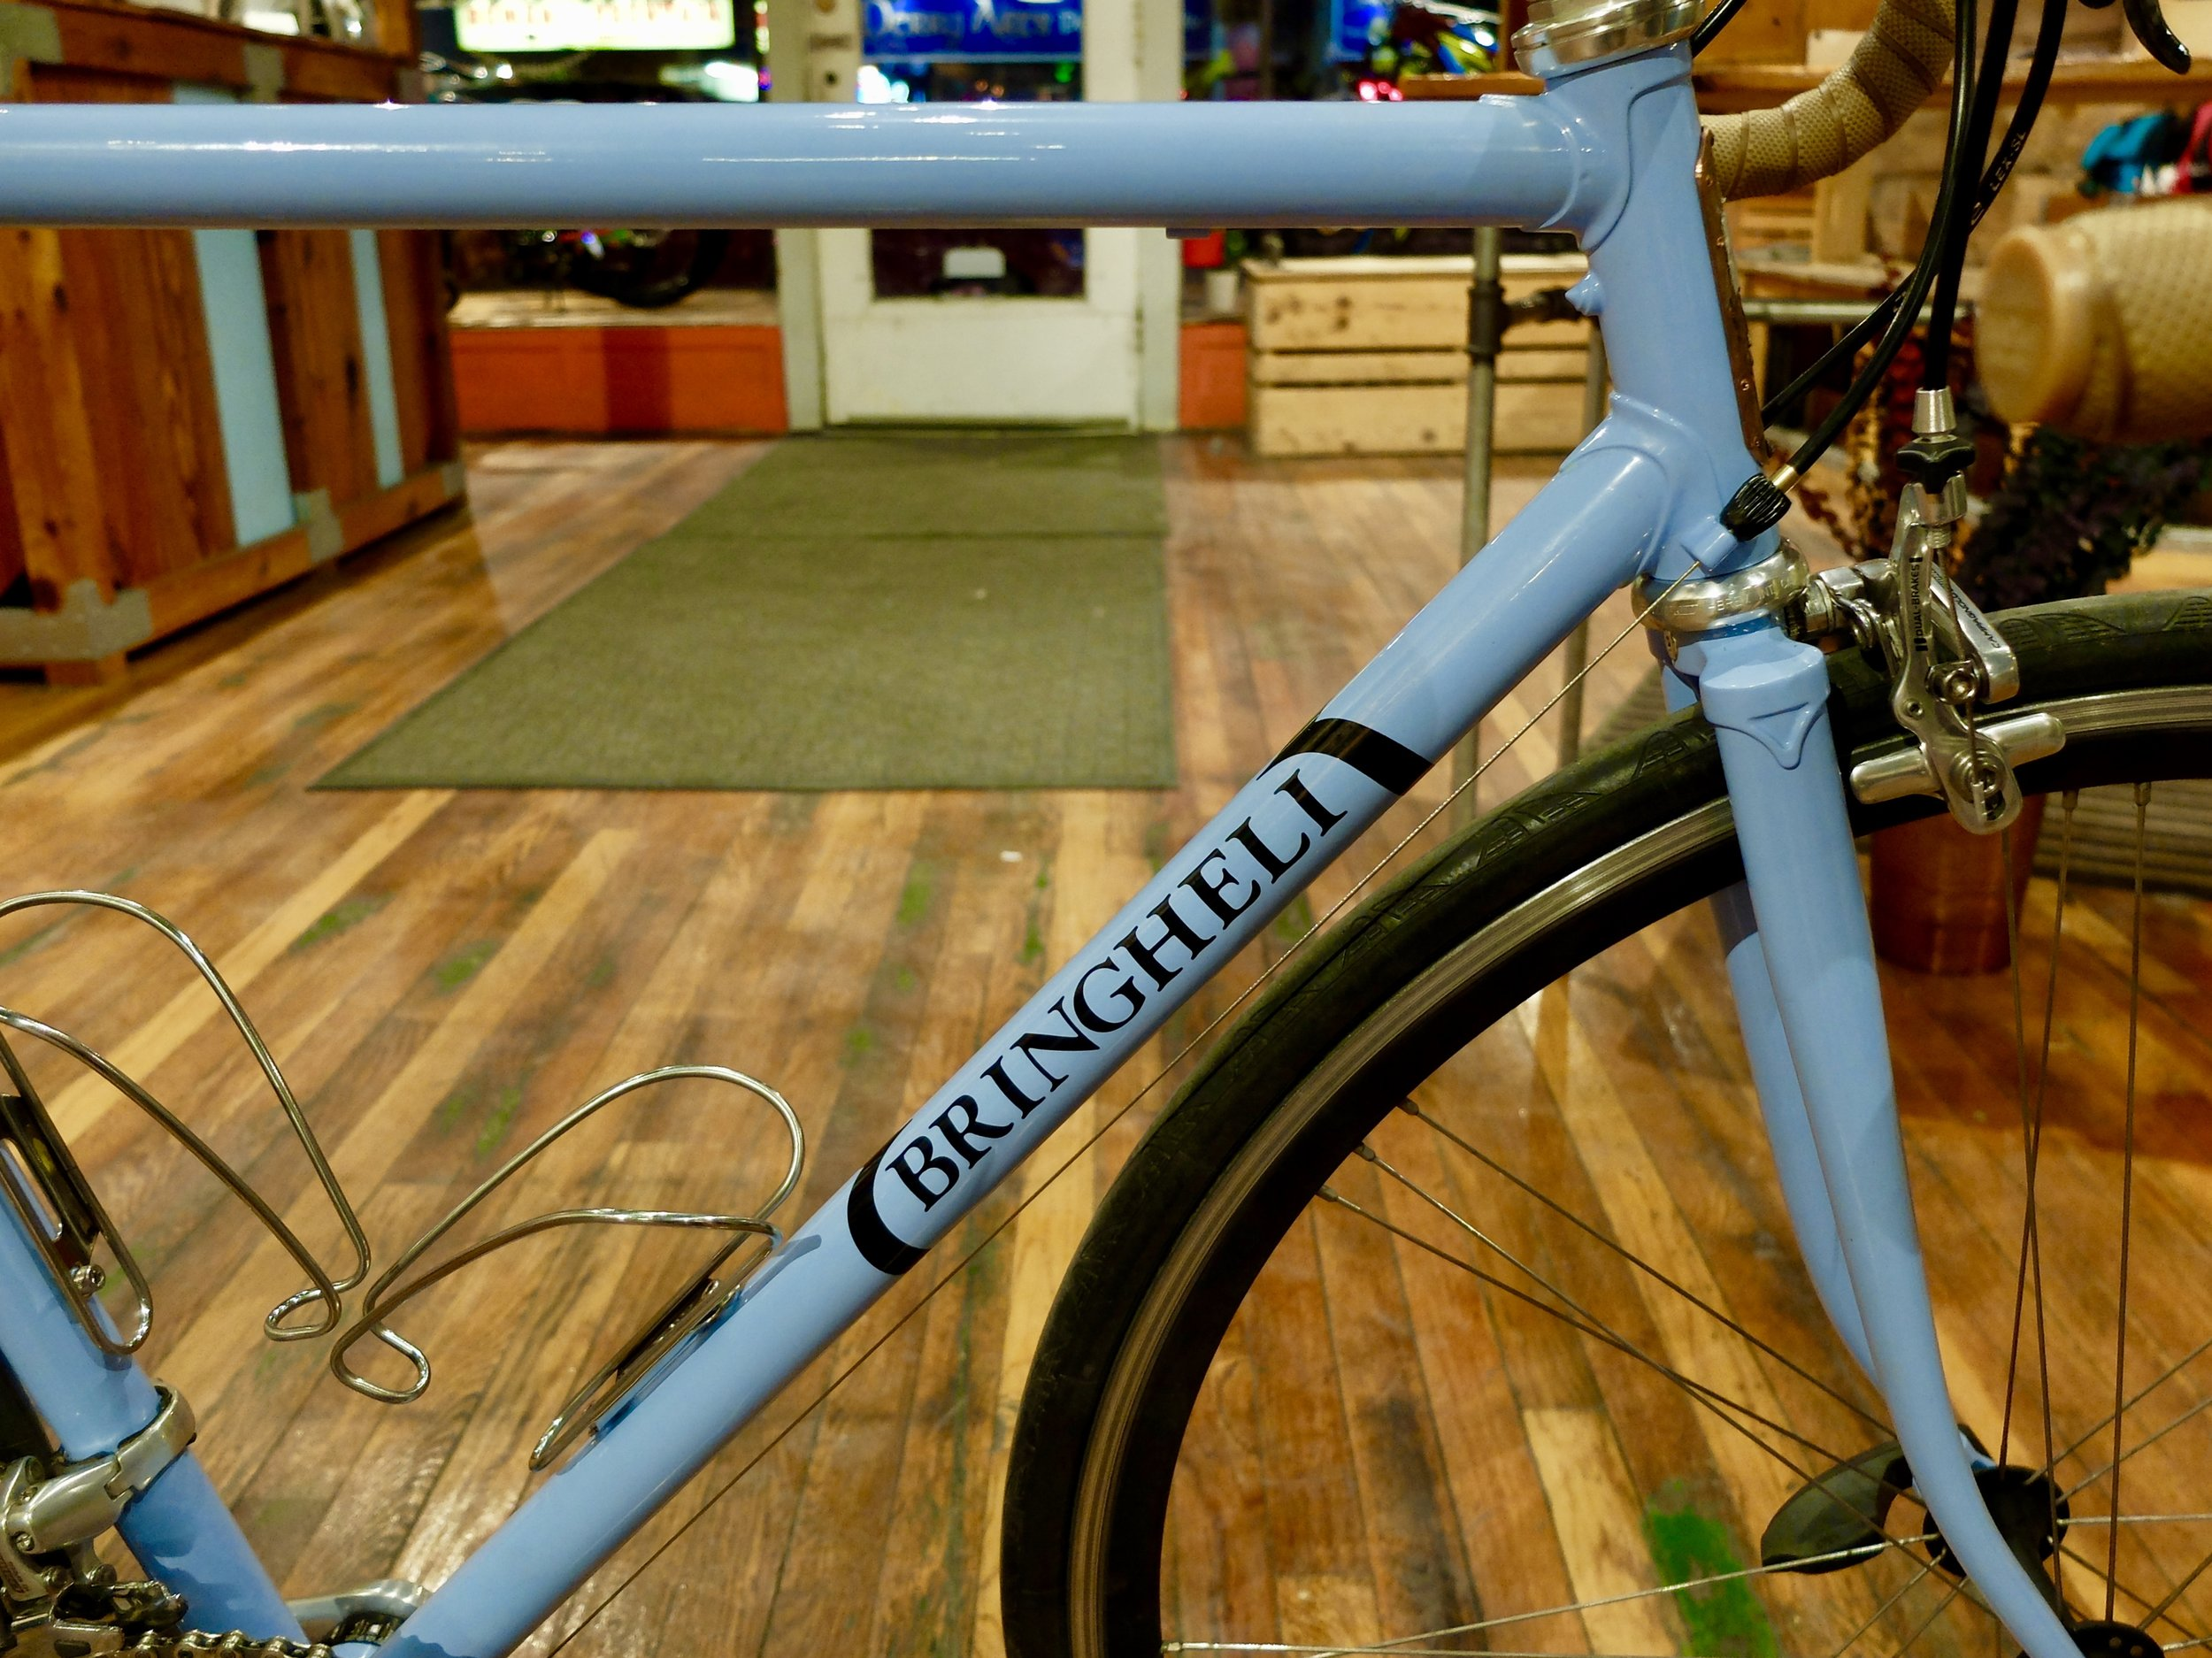 Blue Binghelli Bicycle